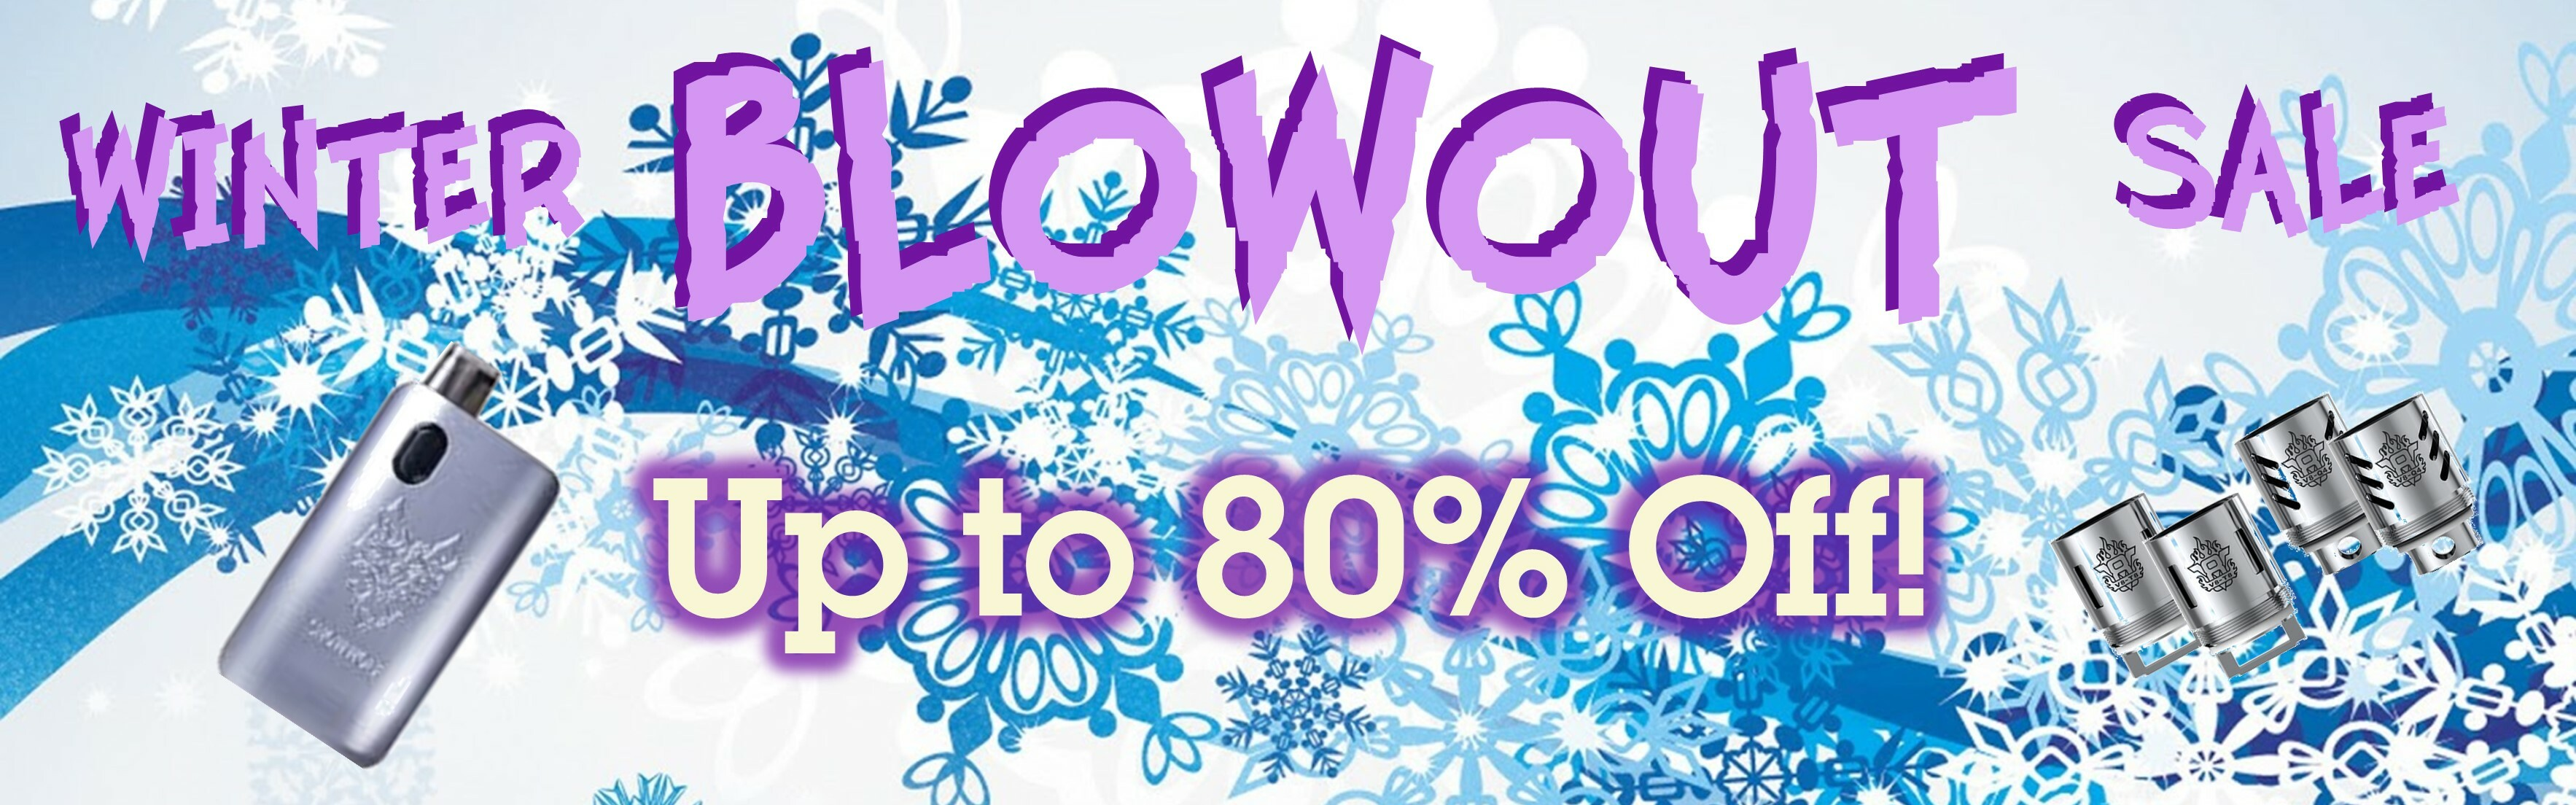 Winter Blowout Sale 2021